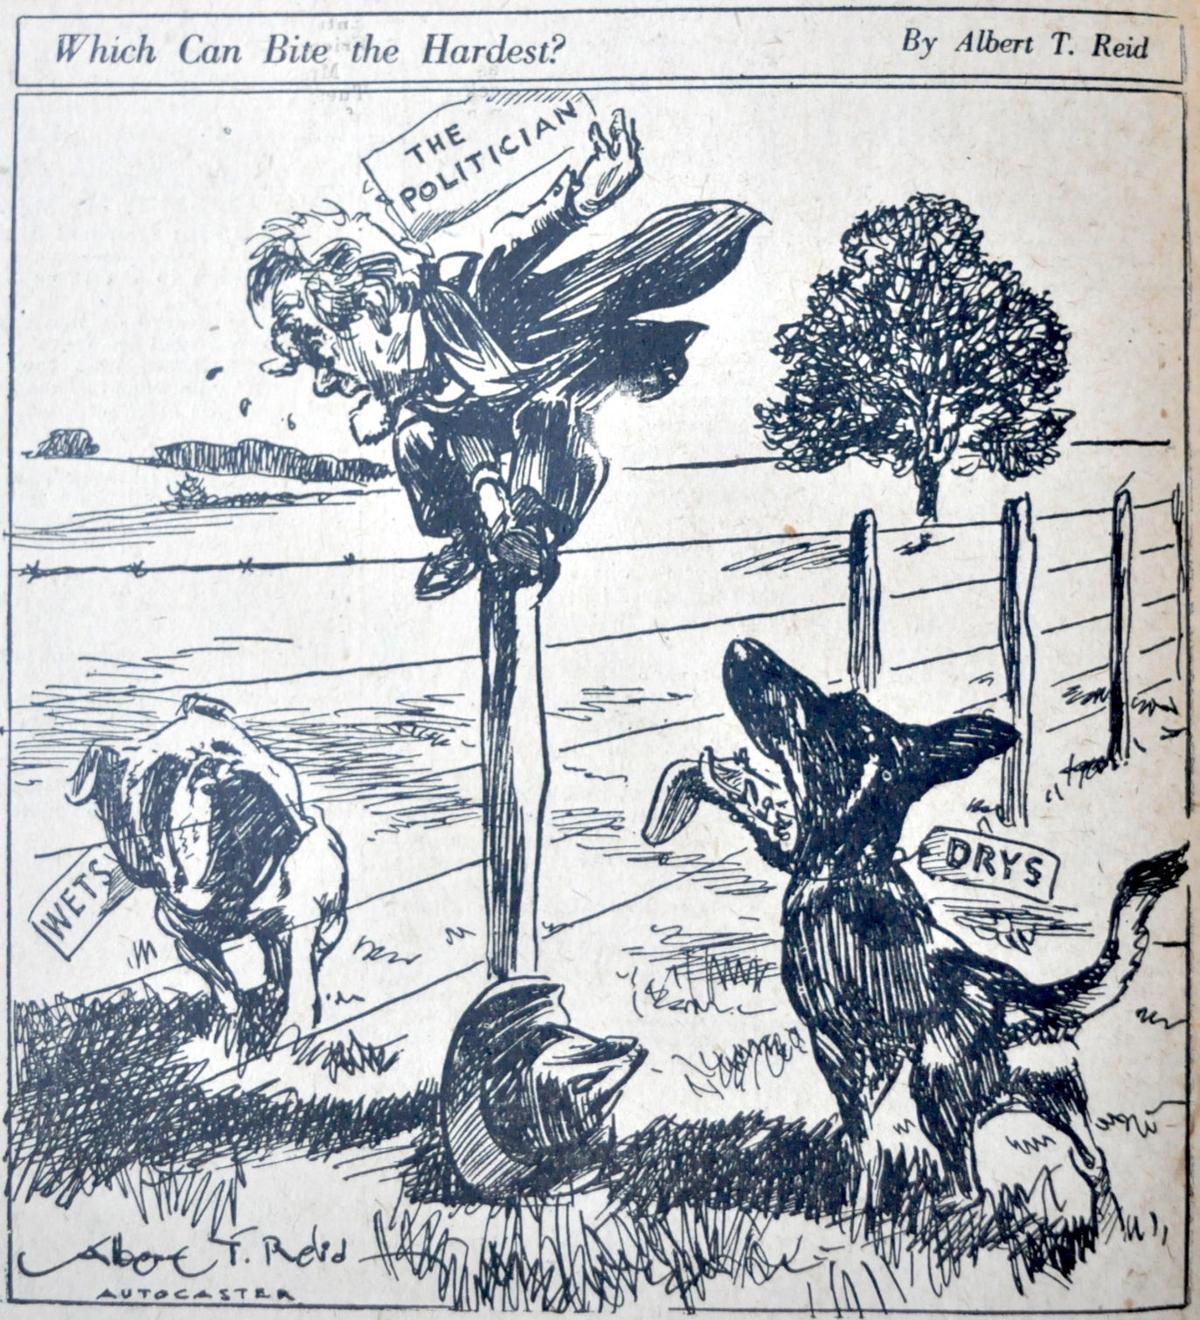 Prohibition era political cartoon